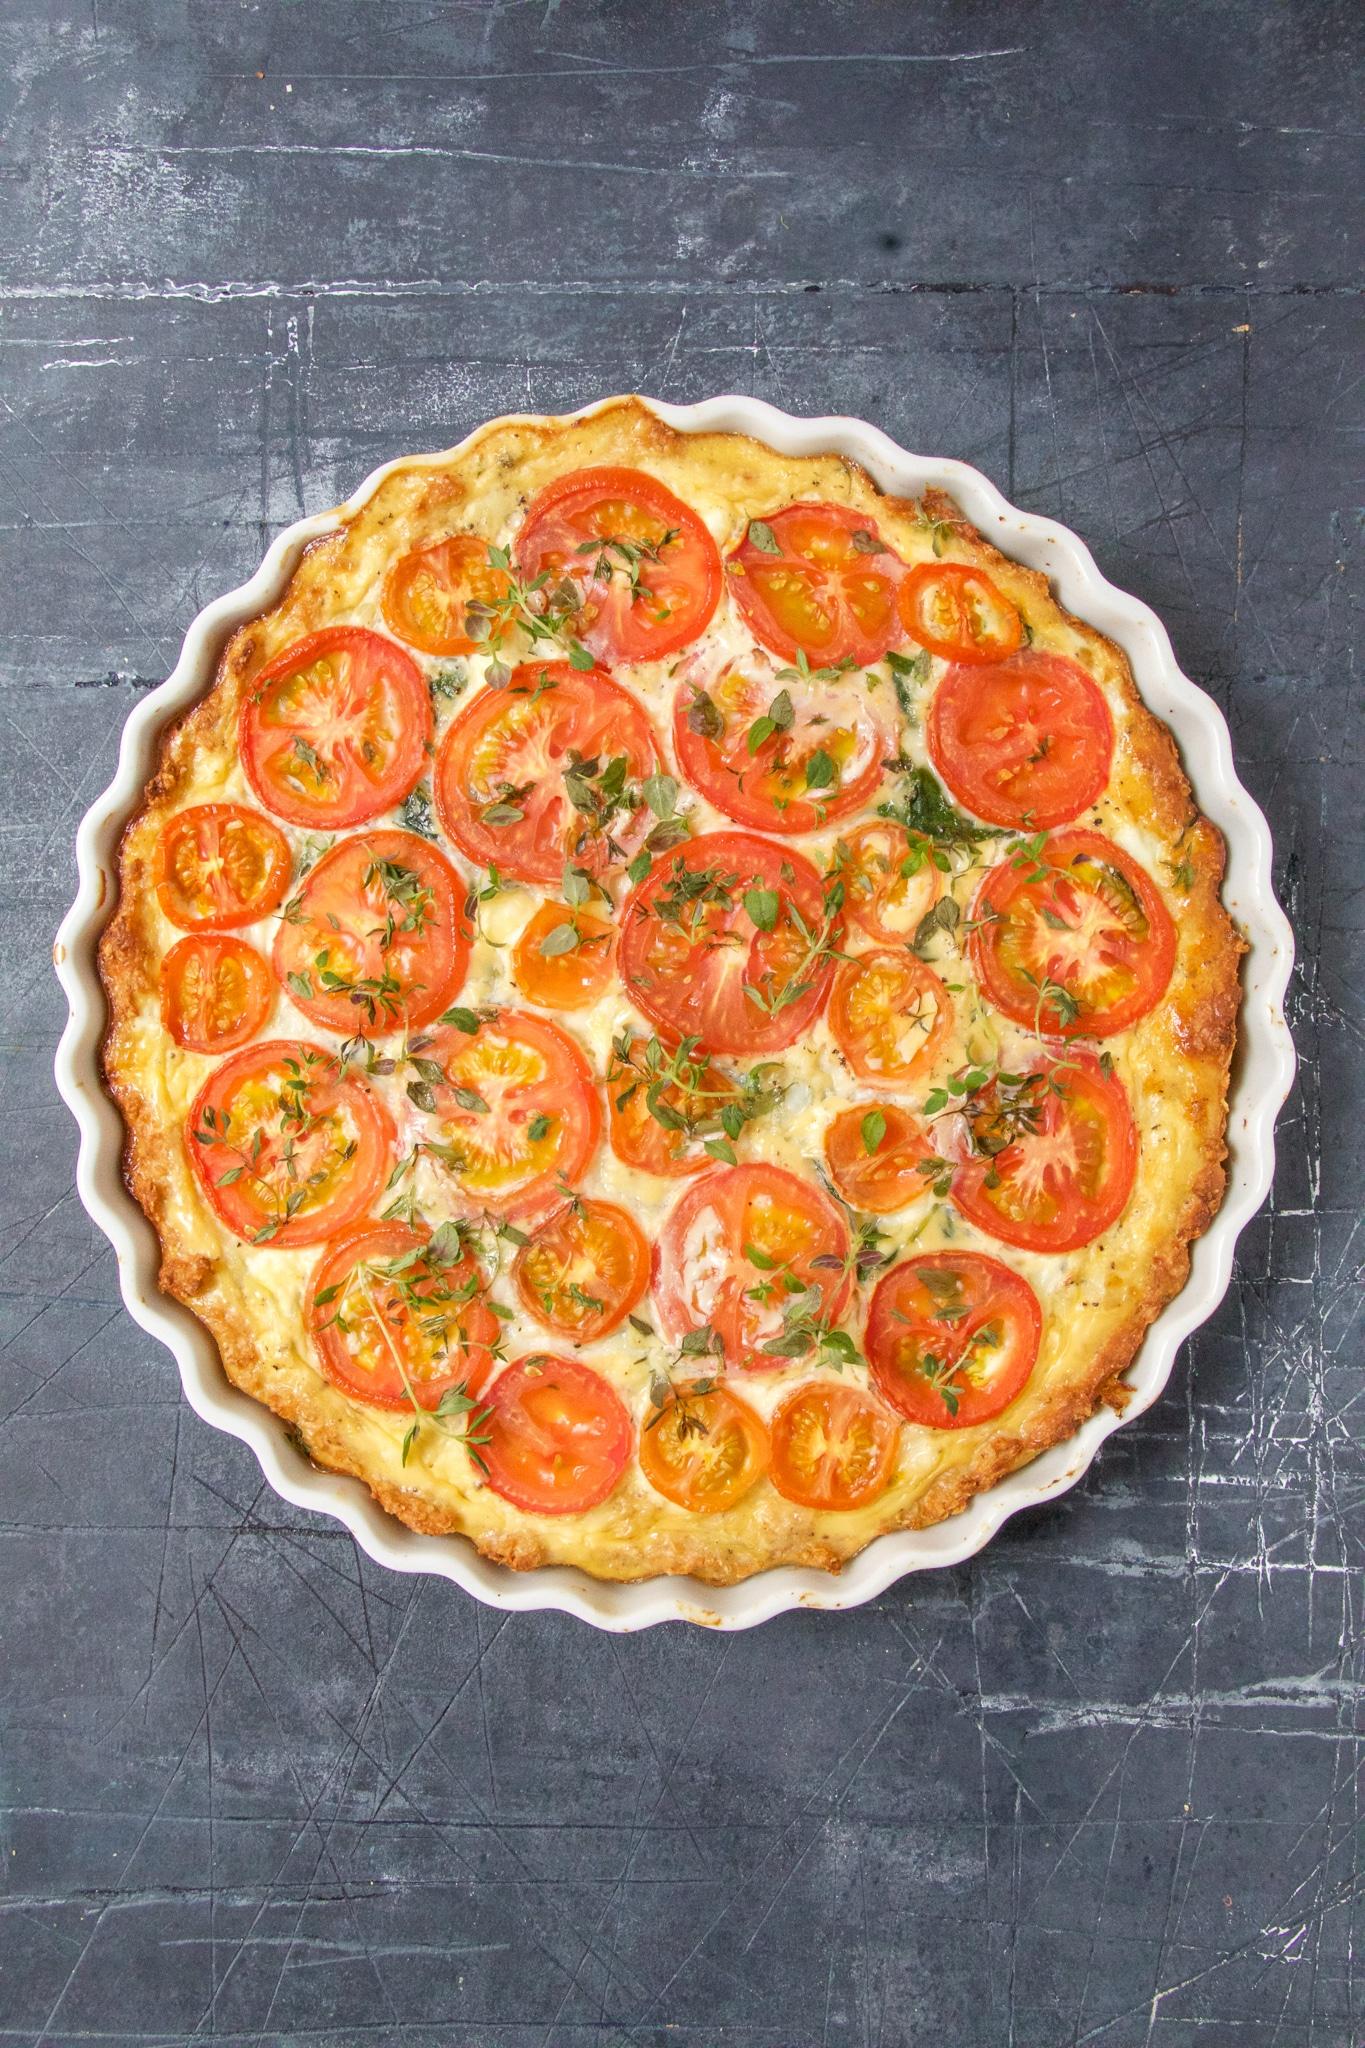 Opskriften på tomattærte